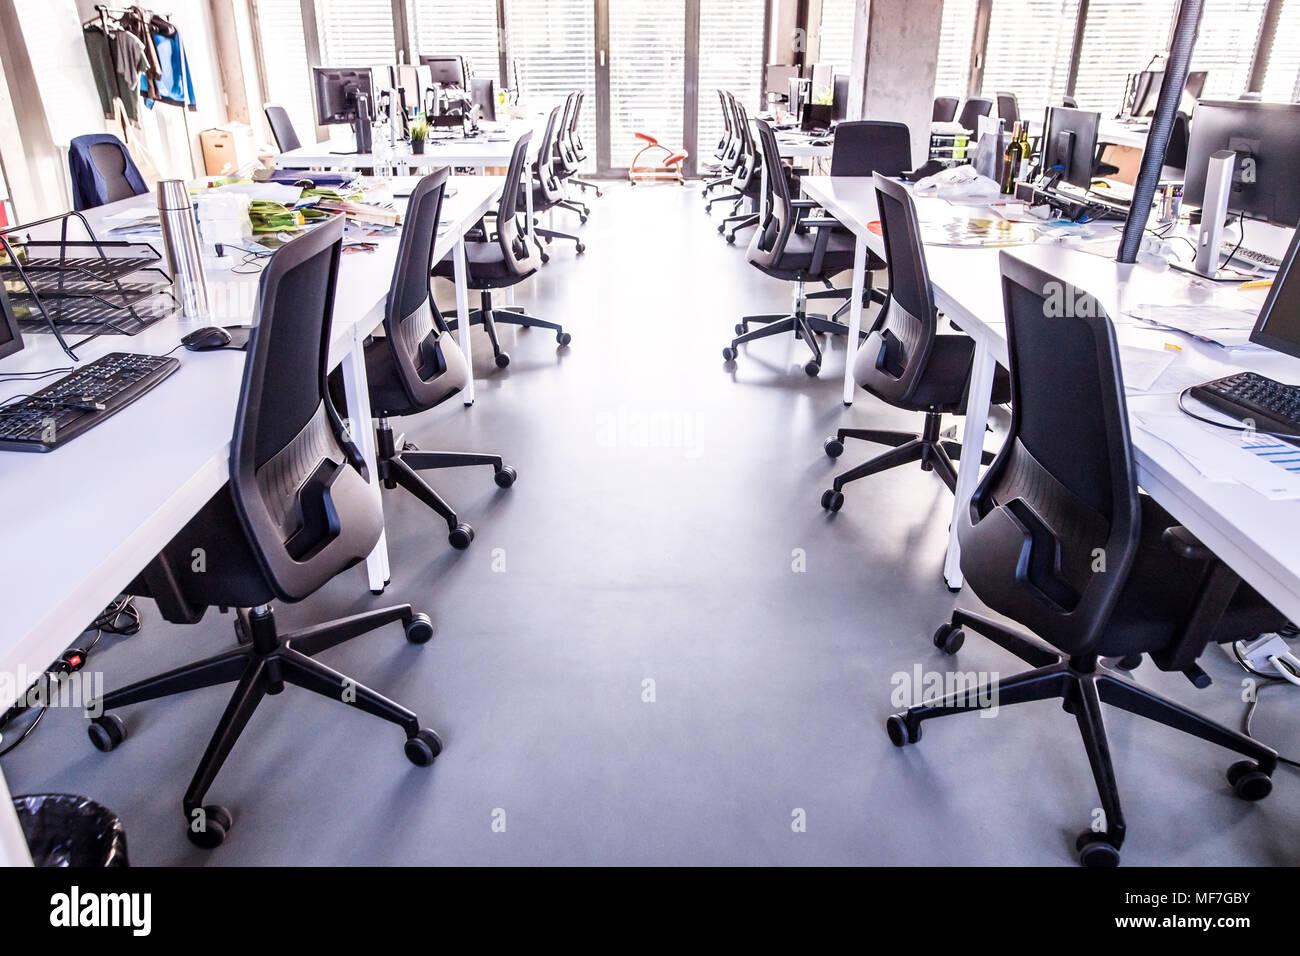 Modern open-plan office - Stock Image